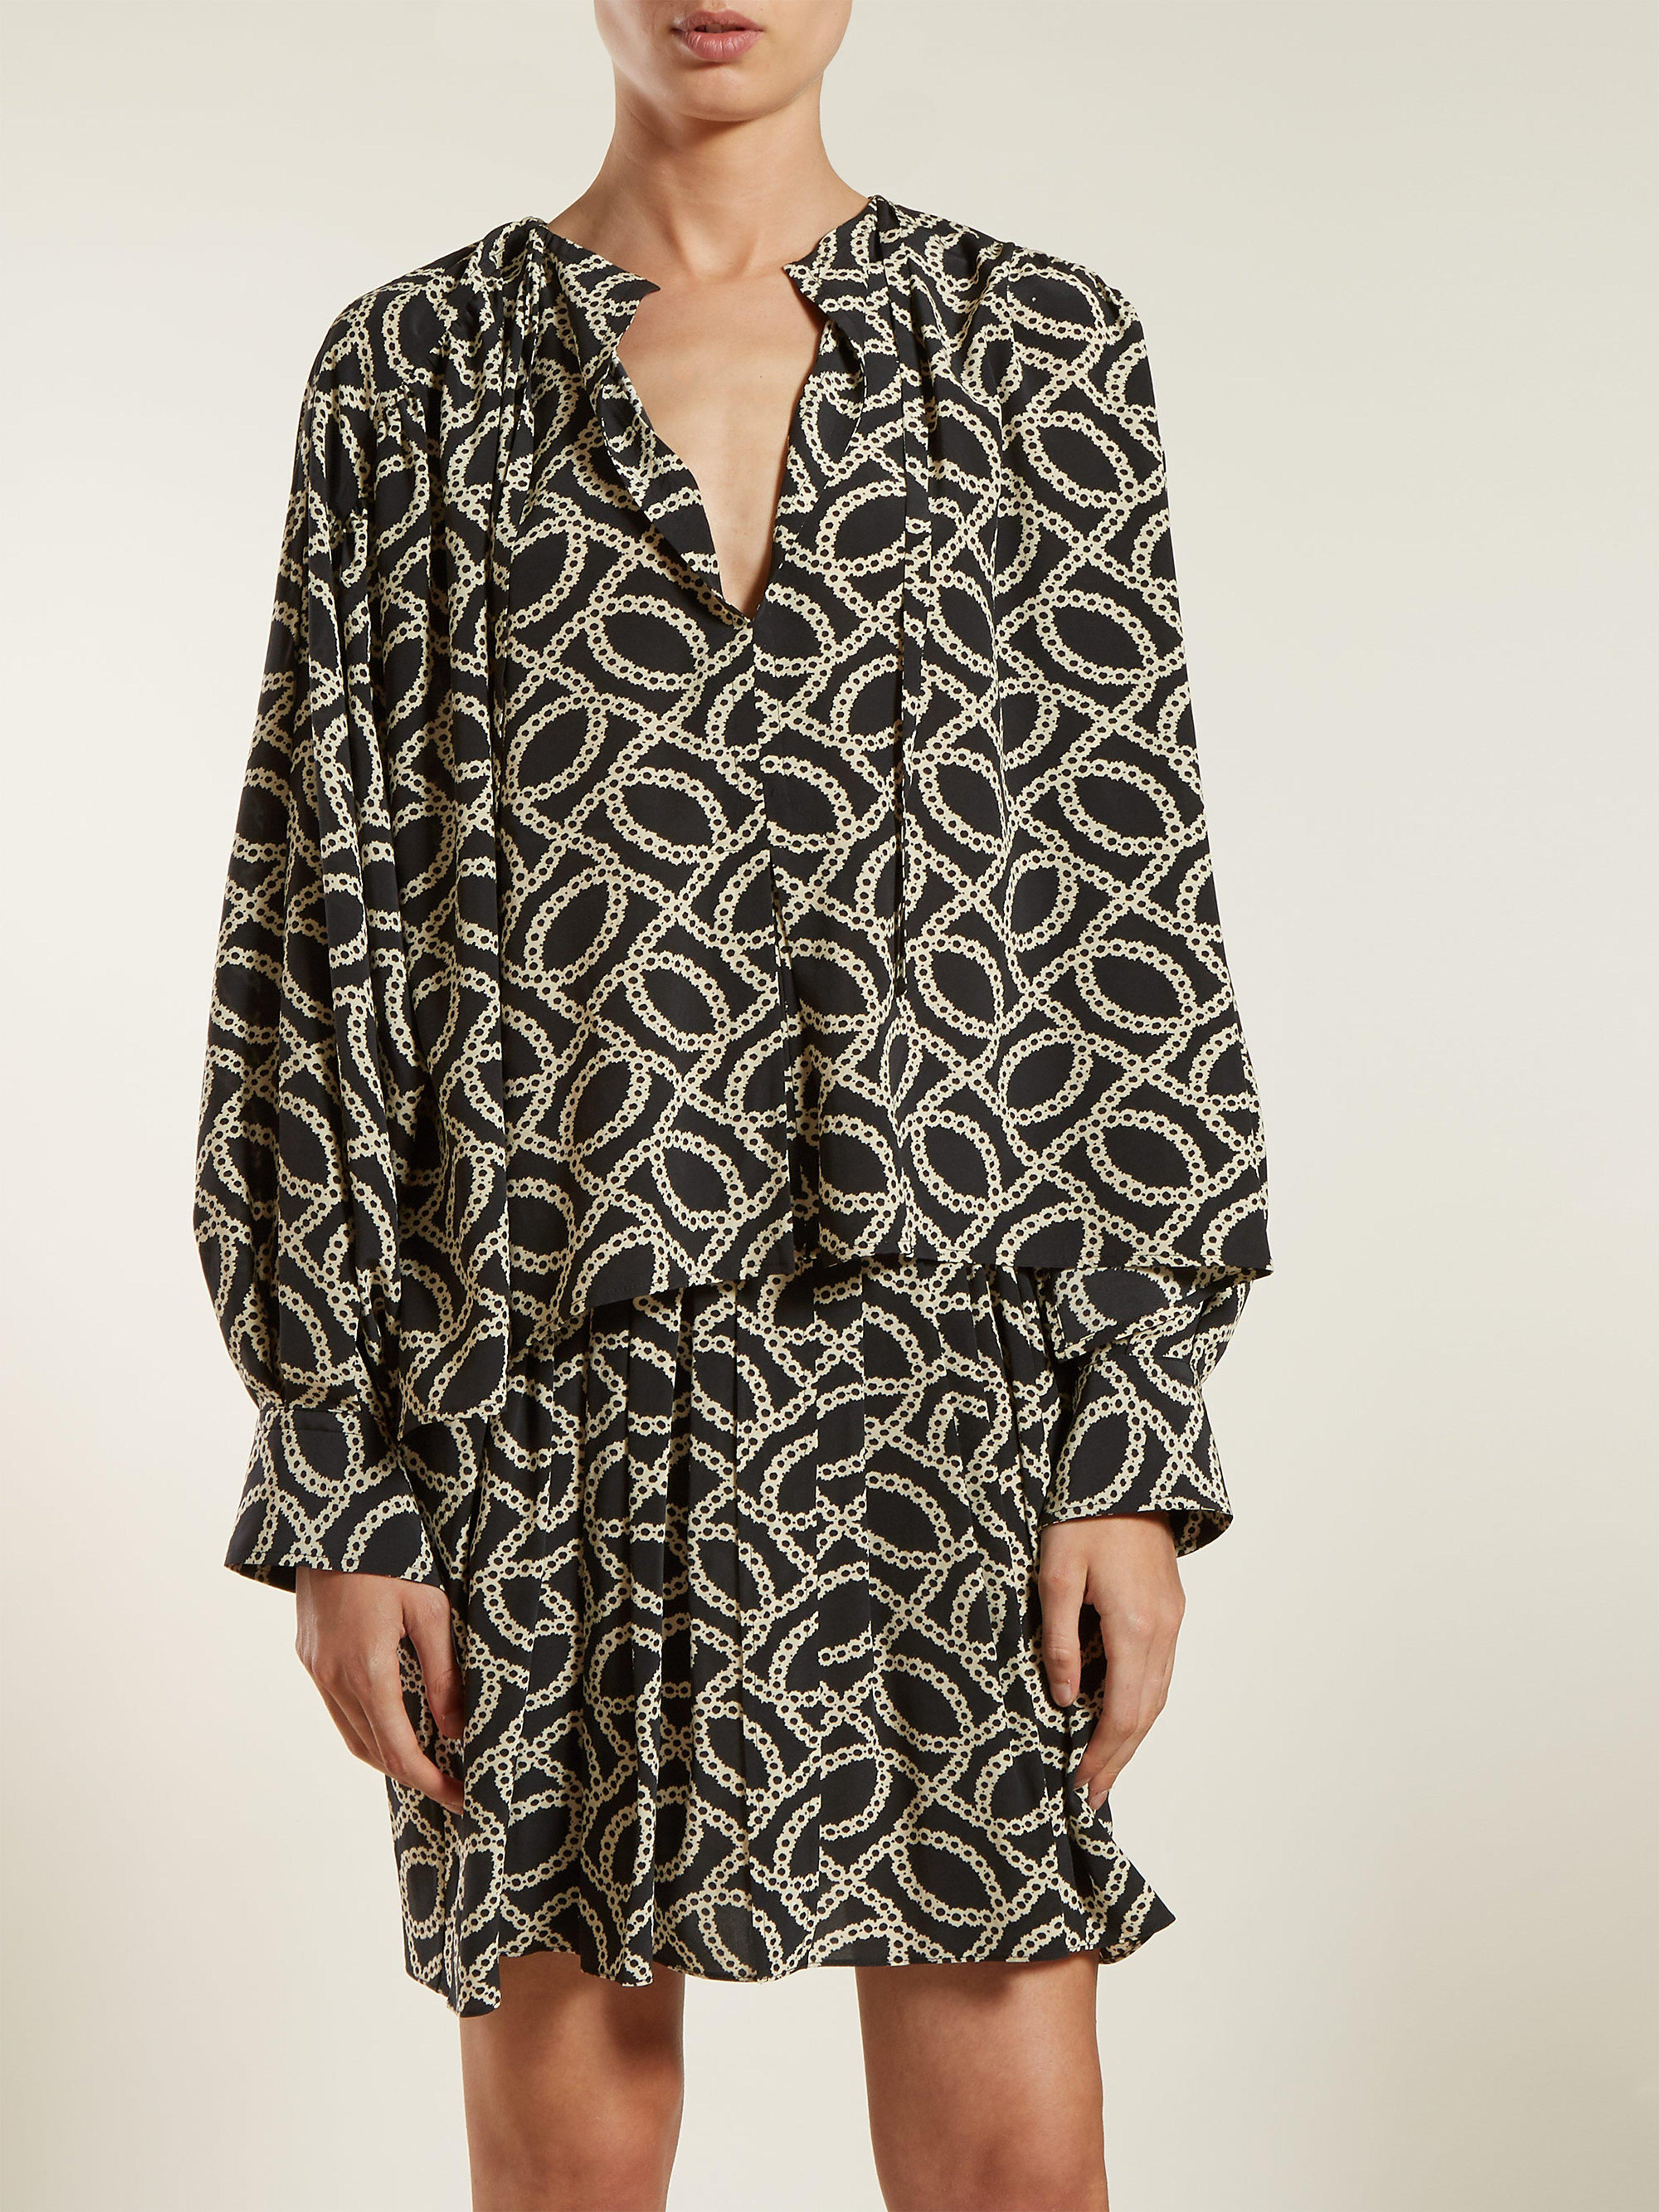 Isabel Amba Lyst Black Crepe Print In Blouse Marant Cog 92YIWEDH